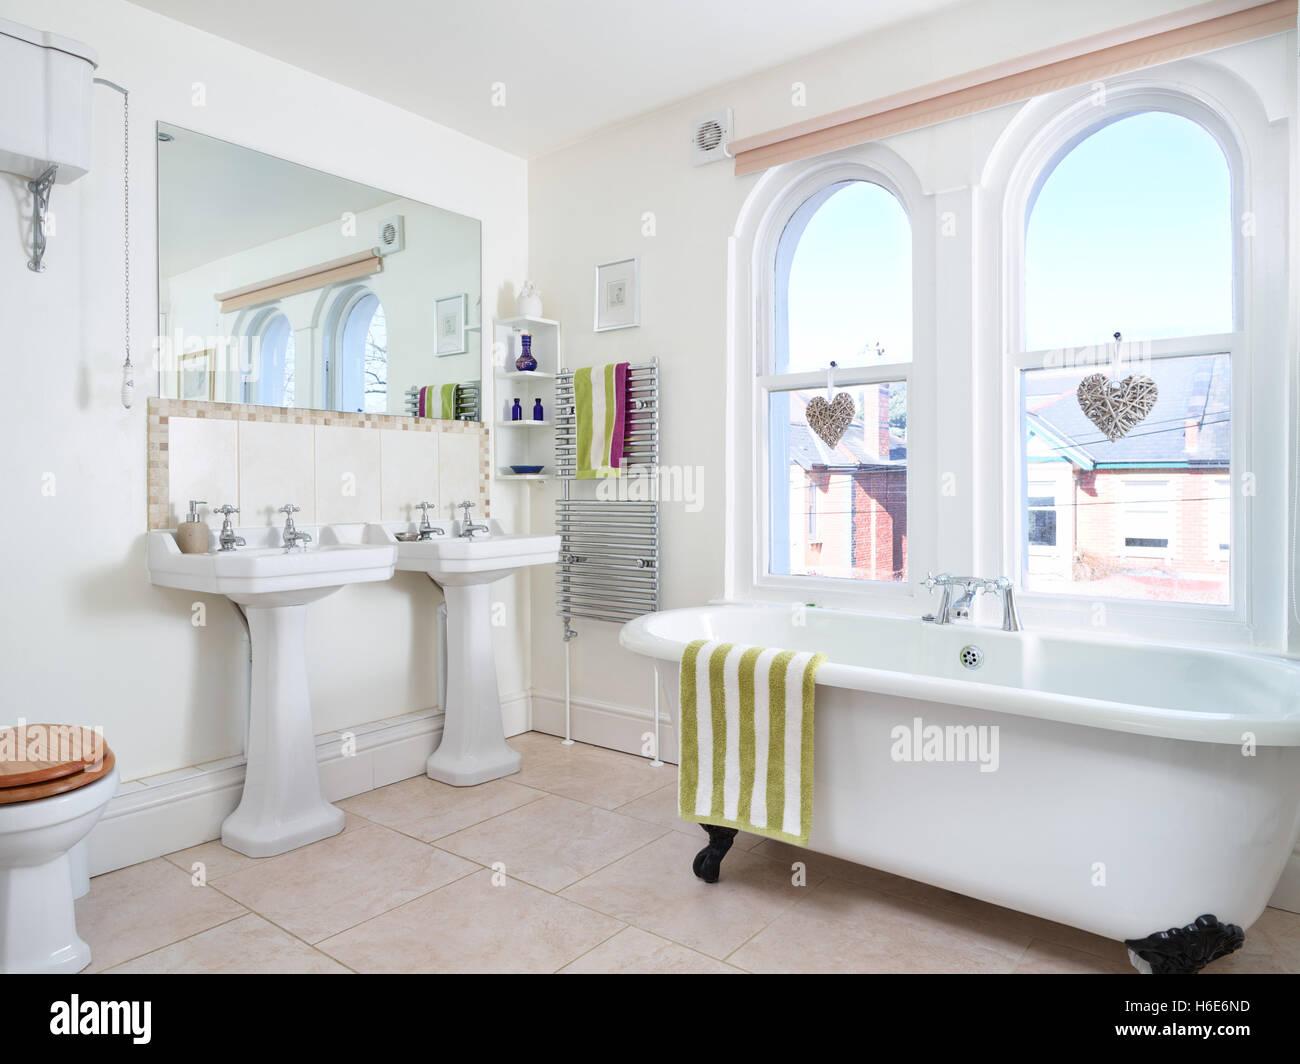 Victorian Bath Bathroom Stock Photos & Victorian Bath Bathroom Stock ...